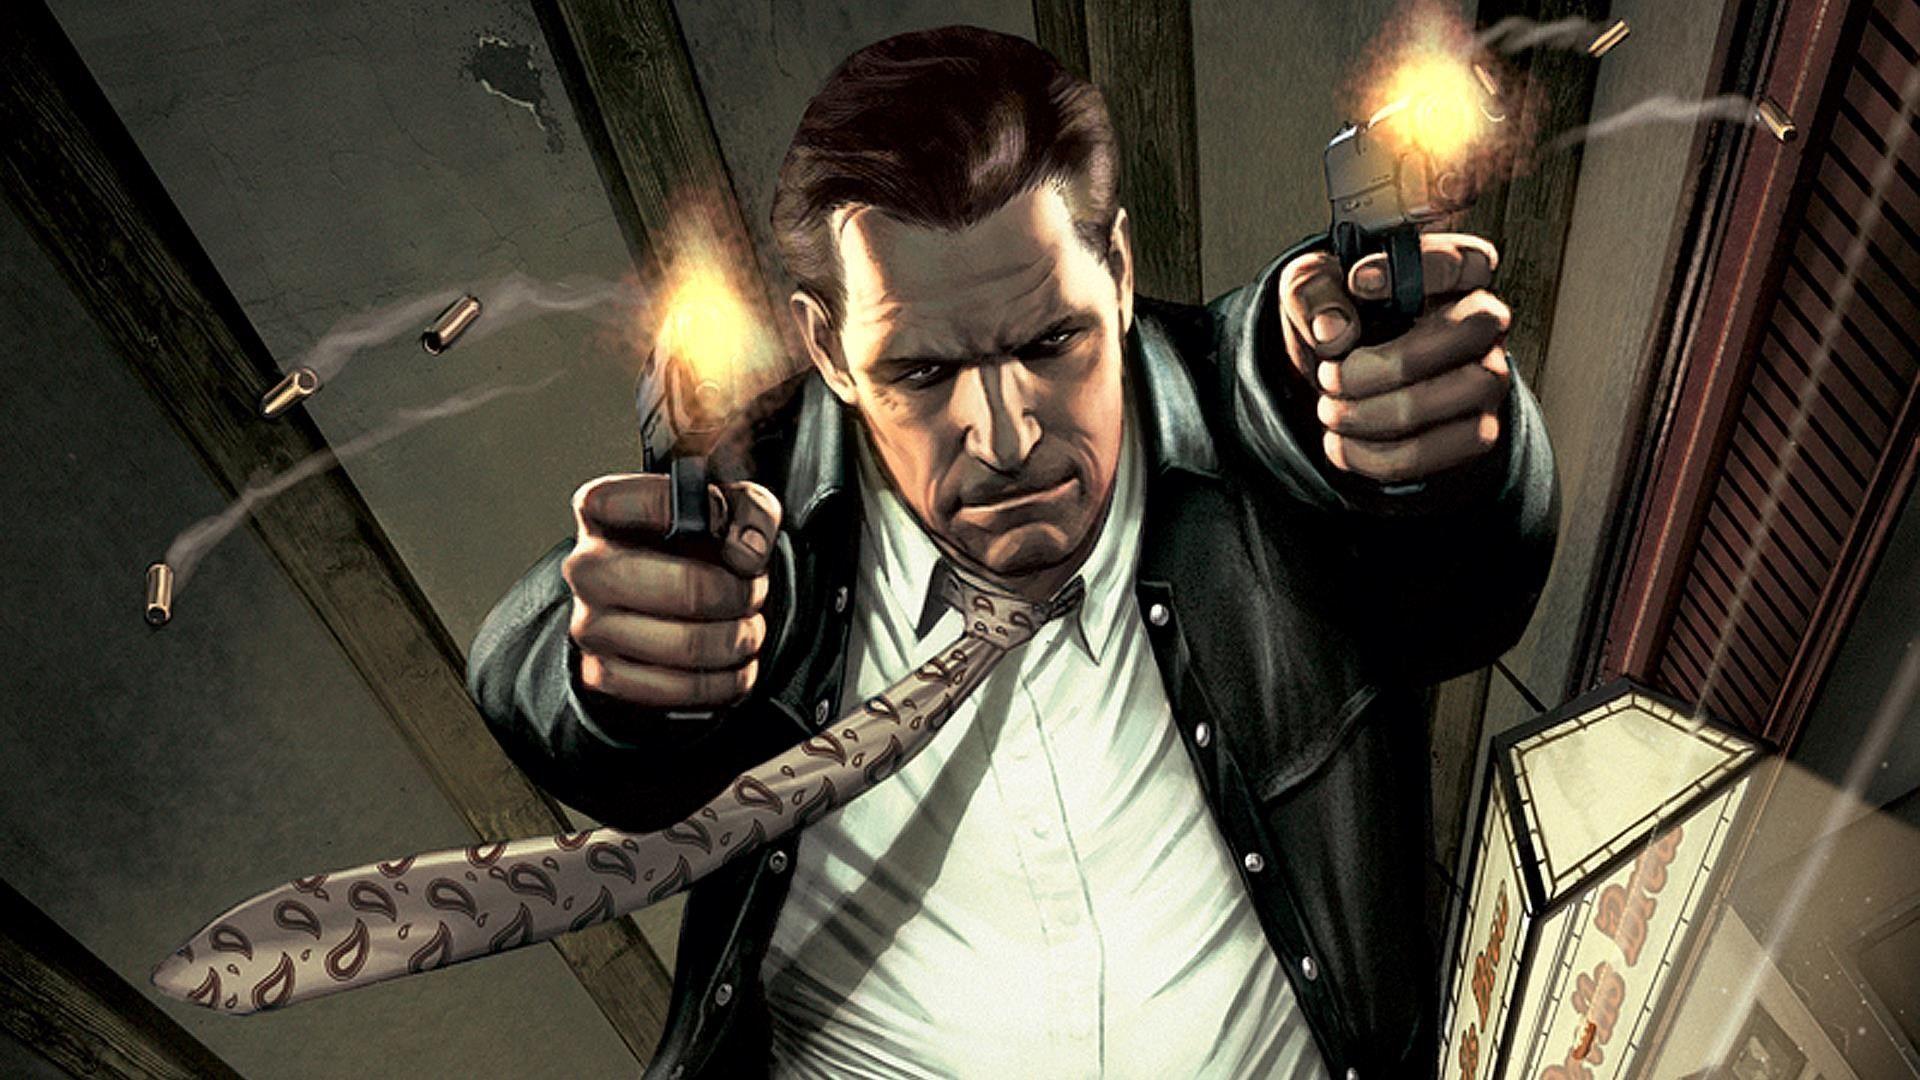 Wonderful Wallpaper Movie Max Payne - 83a5e4c60d581e2757e9f4ef5faeea67  Perfect Image Reference_713621.jpg